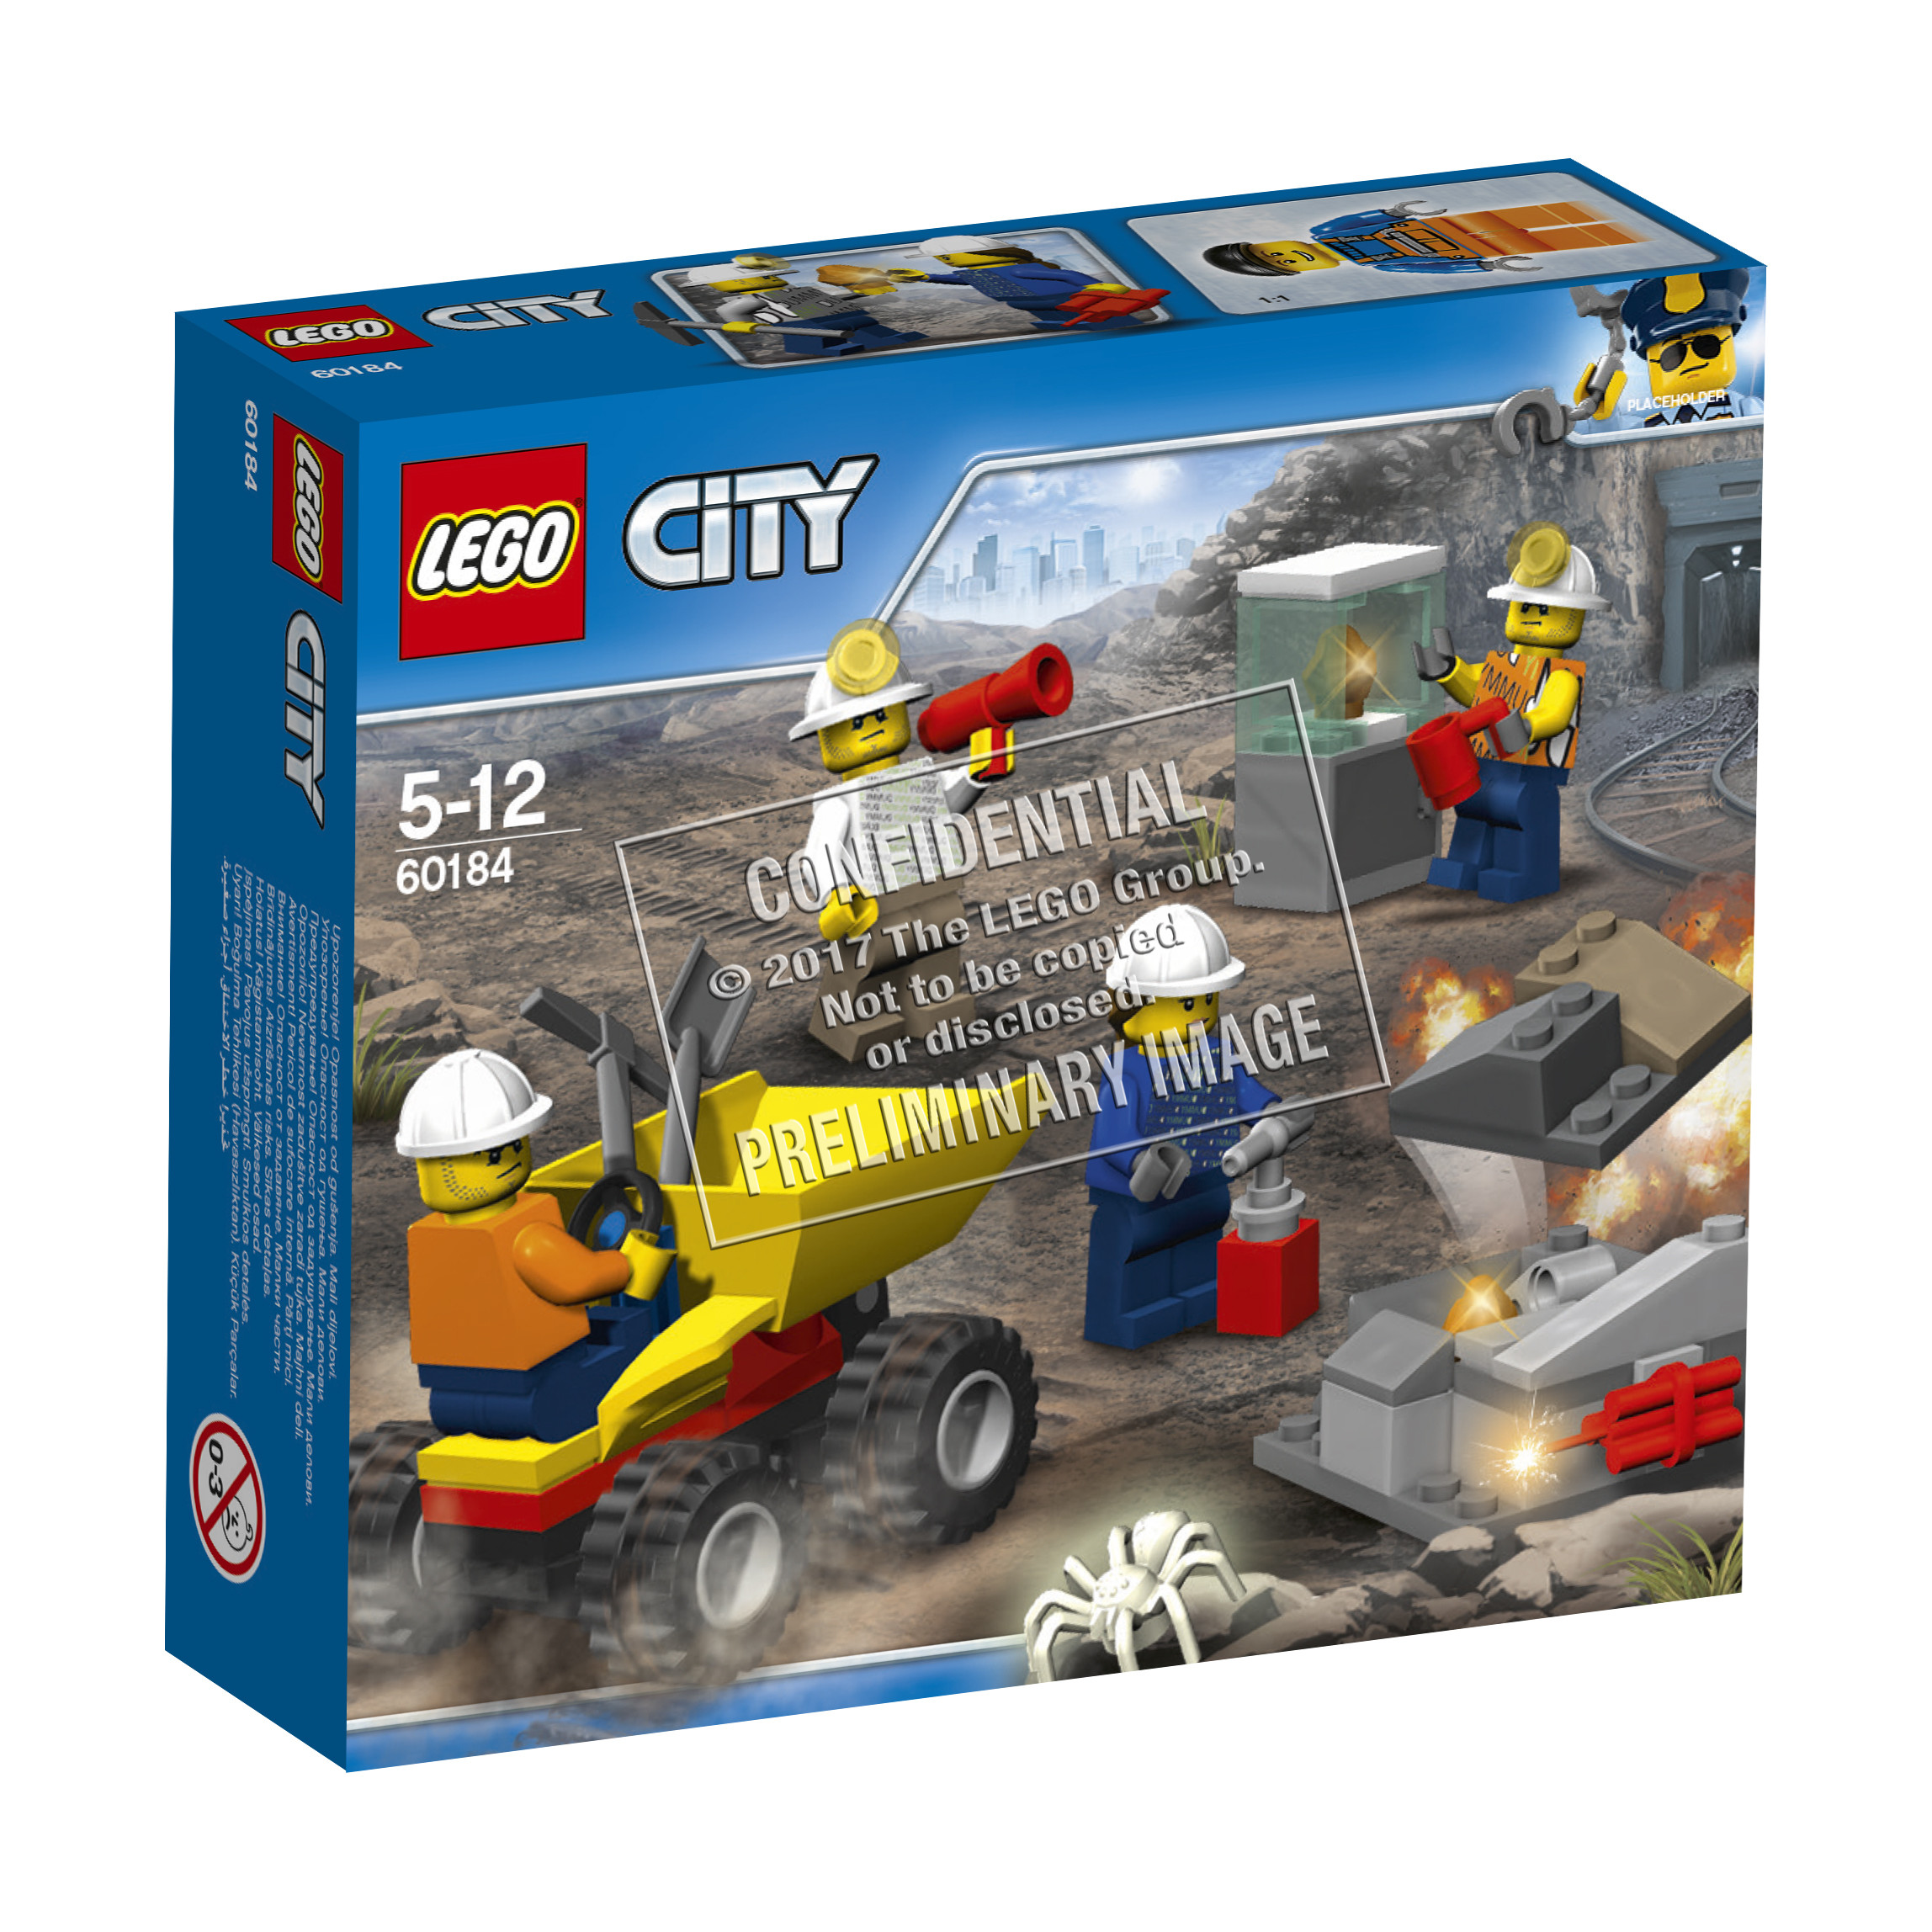 Конструктор LEGO City Mining 60184 Бригада шахтеров конструктор lego city mining 60184 бригада шахтеров